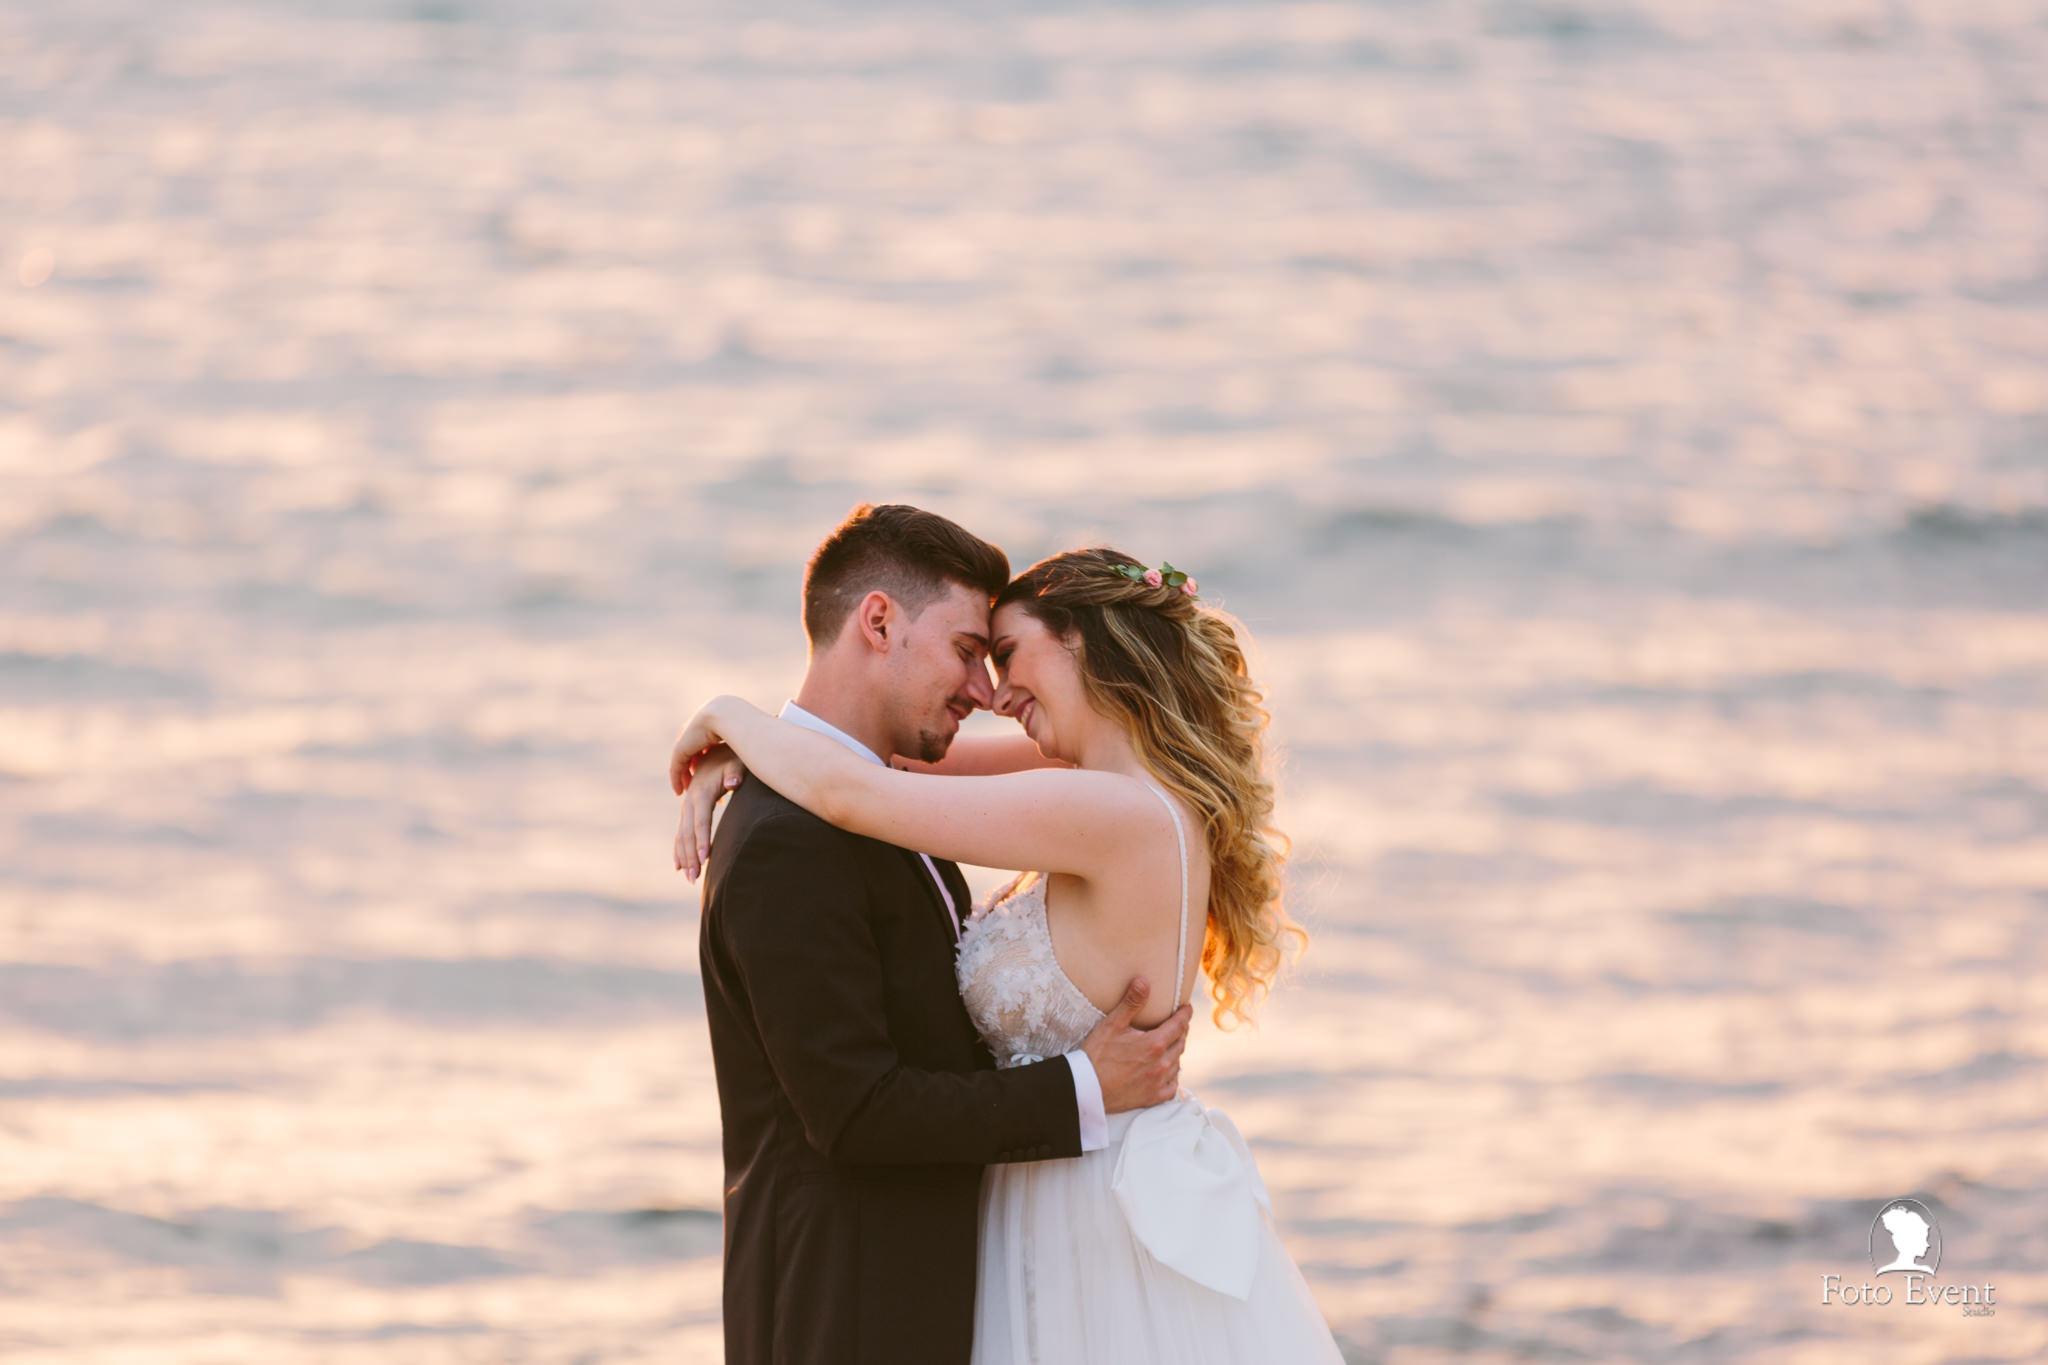 048-2019-08-22-Matrimonio-Angela-e-Nicola-Iaconis-zoom-697